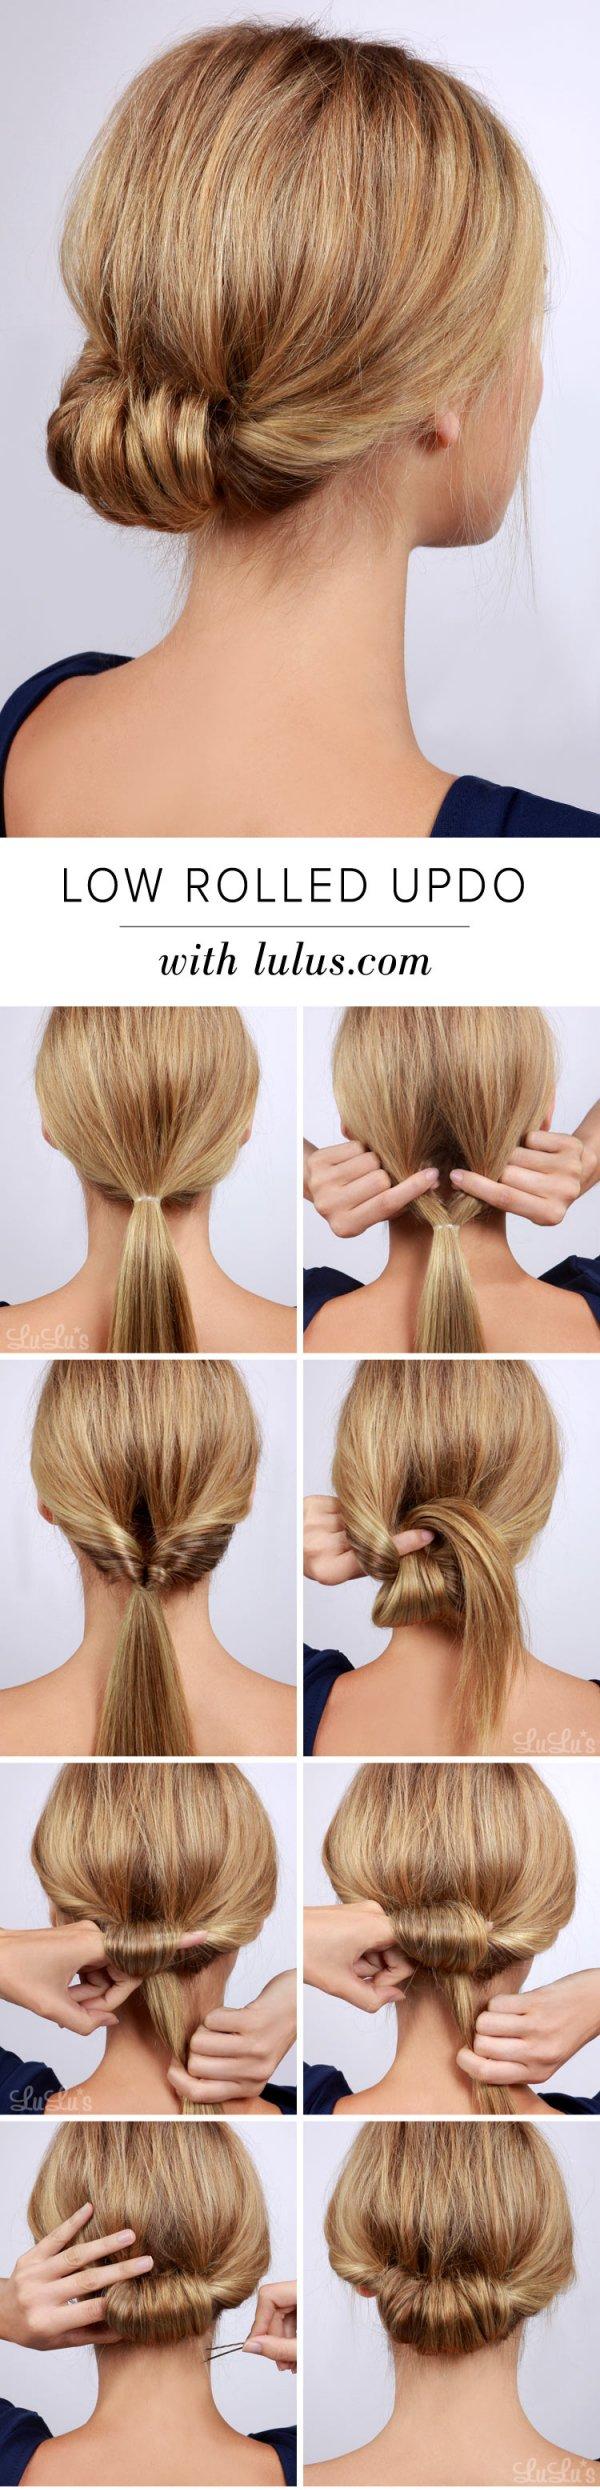 hair,hairstyle,brown,blond,long hair,